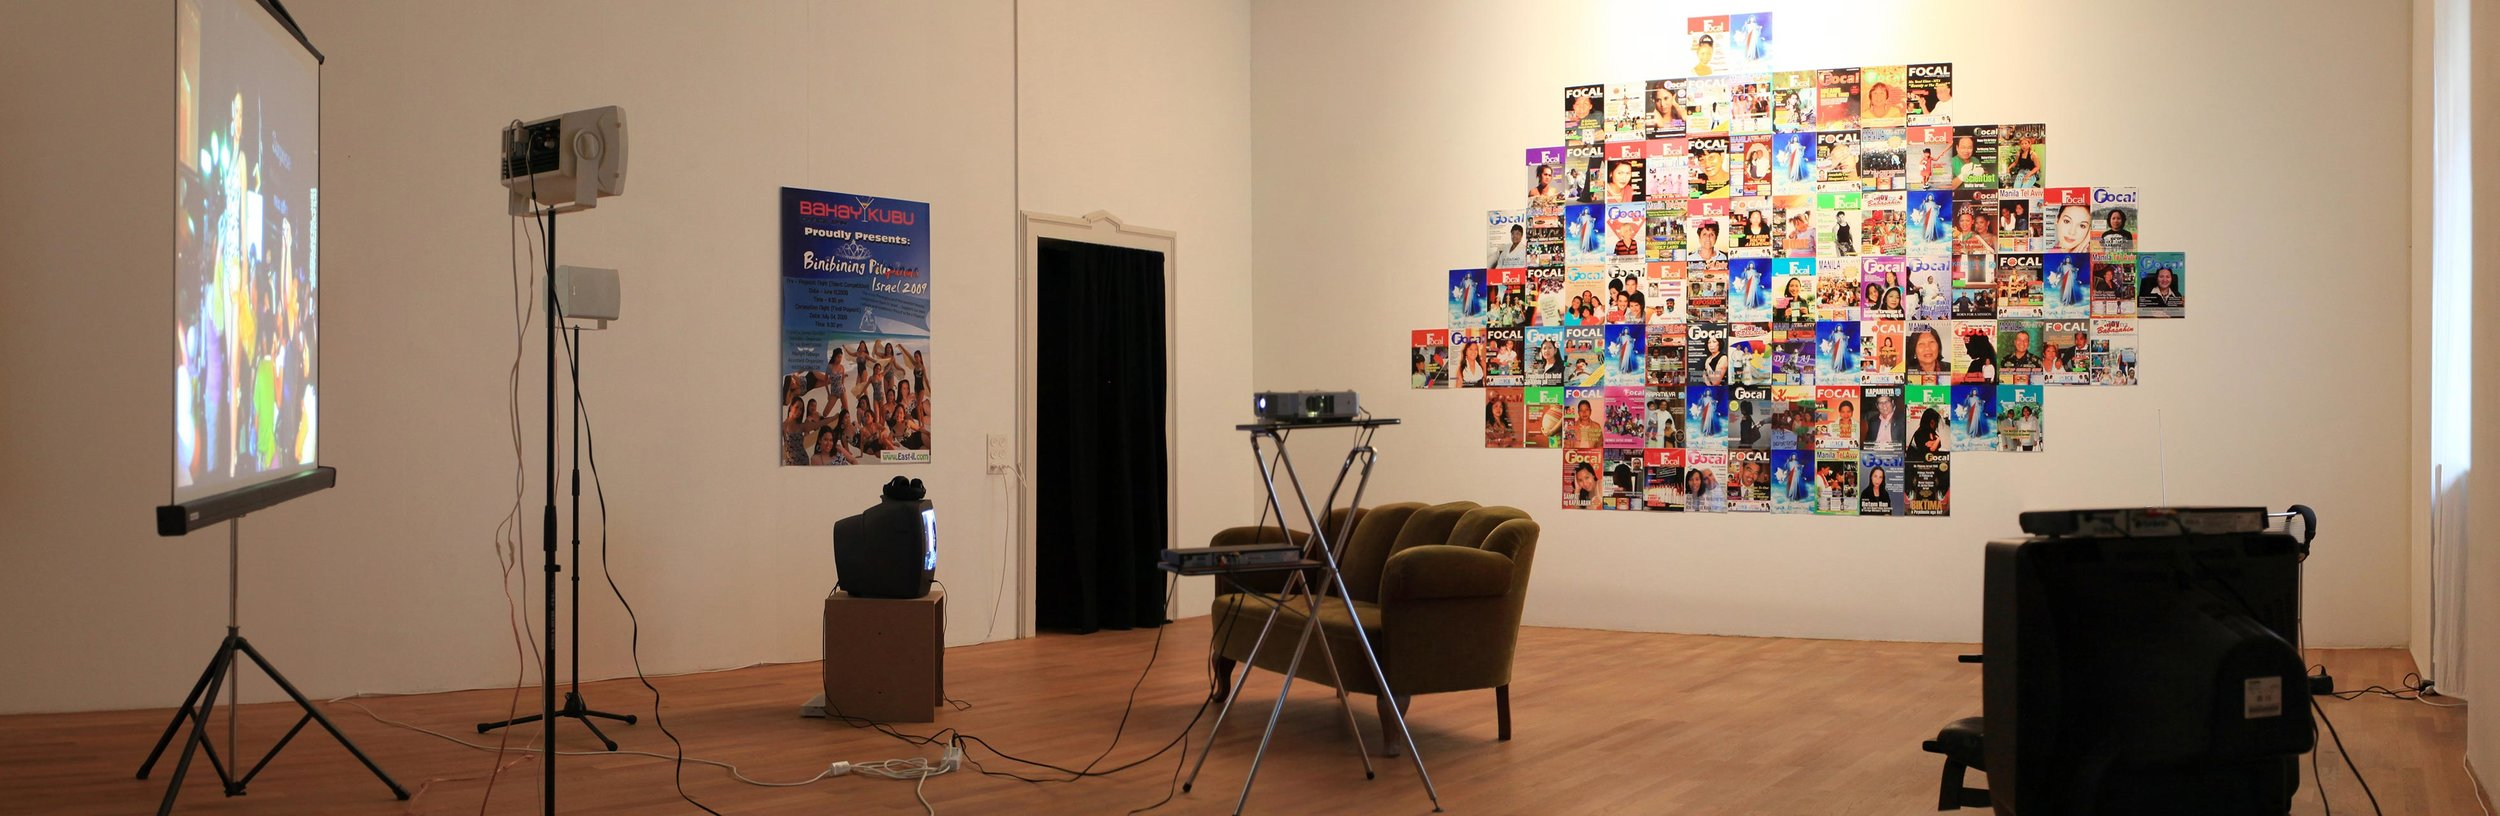 Koken-Ergun-Kunsthalle-Winterthur-2011.jpg